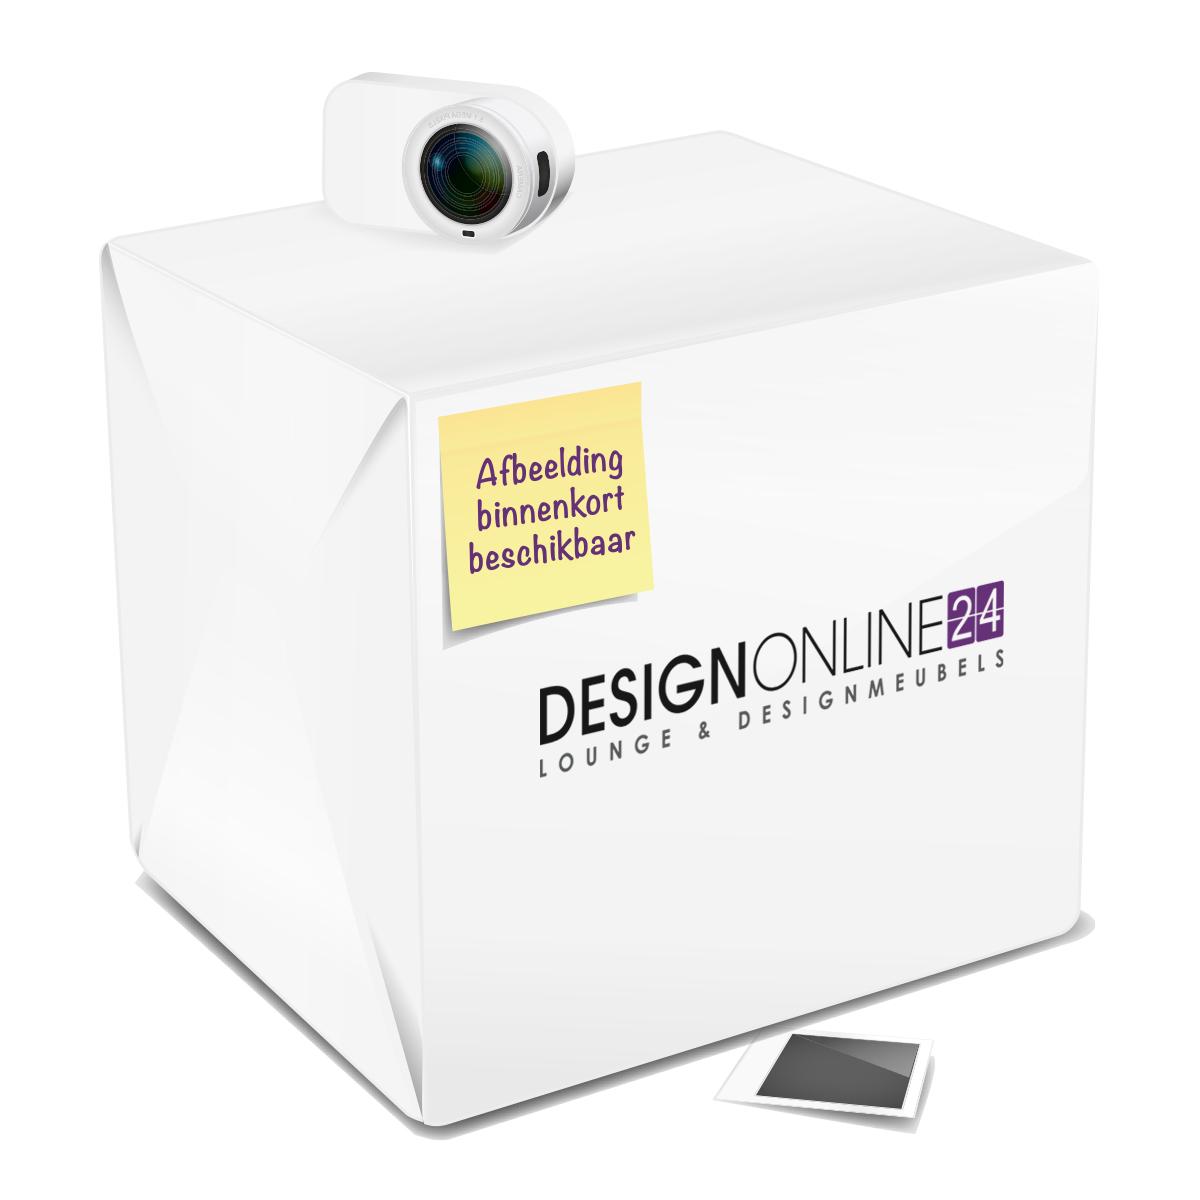 24Designs 24Designs Barkruk Maxime - Zithoogte 77 cm - Chromen onderstel - Kunstleren zitting - Groen